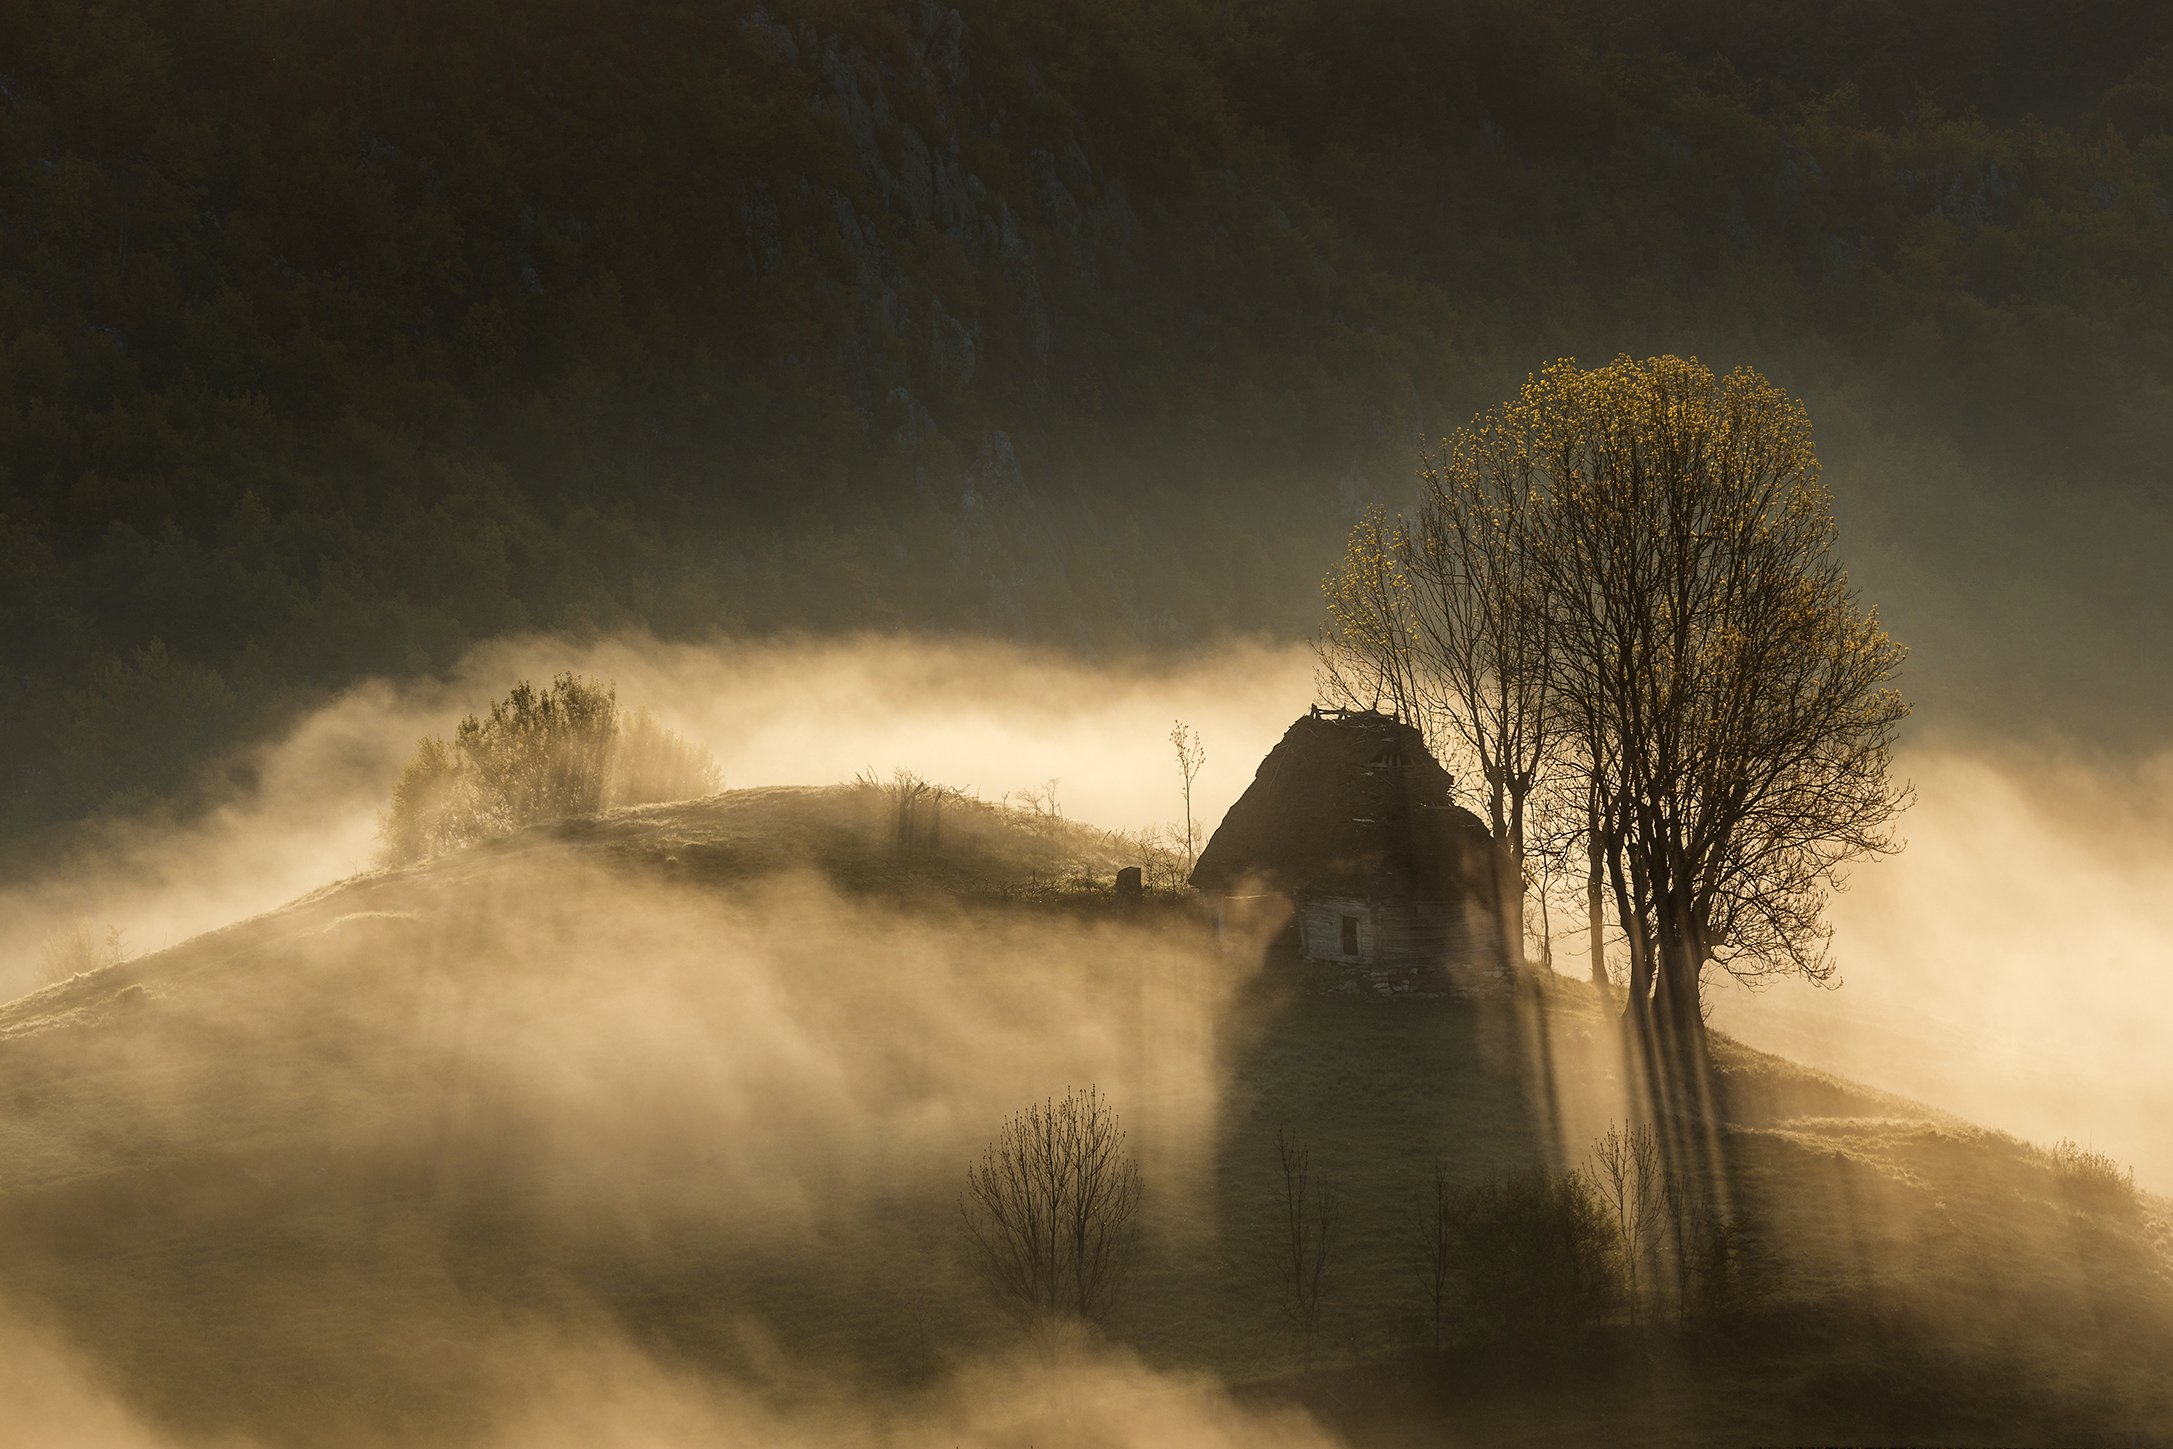 mountain, summer, landscape, travel, natur, romania, colors, apuseni, fog, sunrise, mist, light, Lazar Ioan Ovidiu